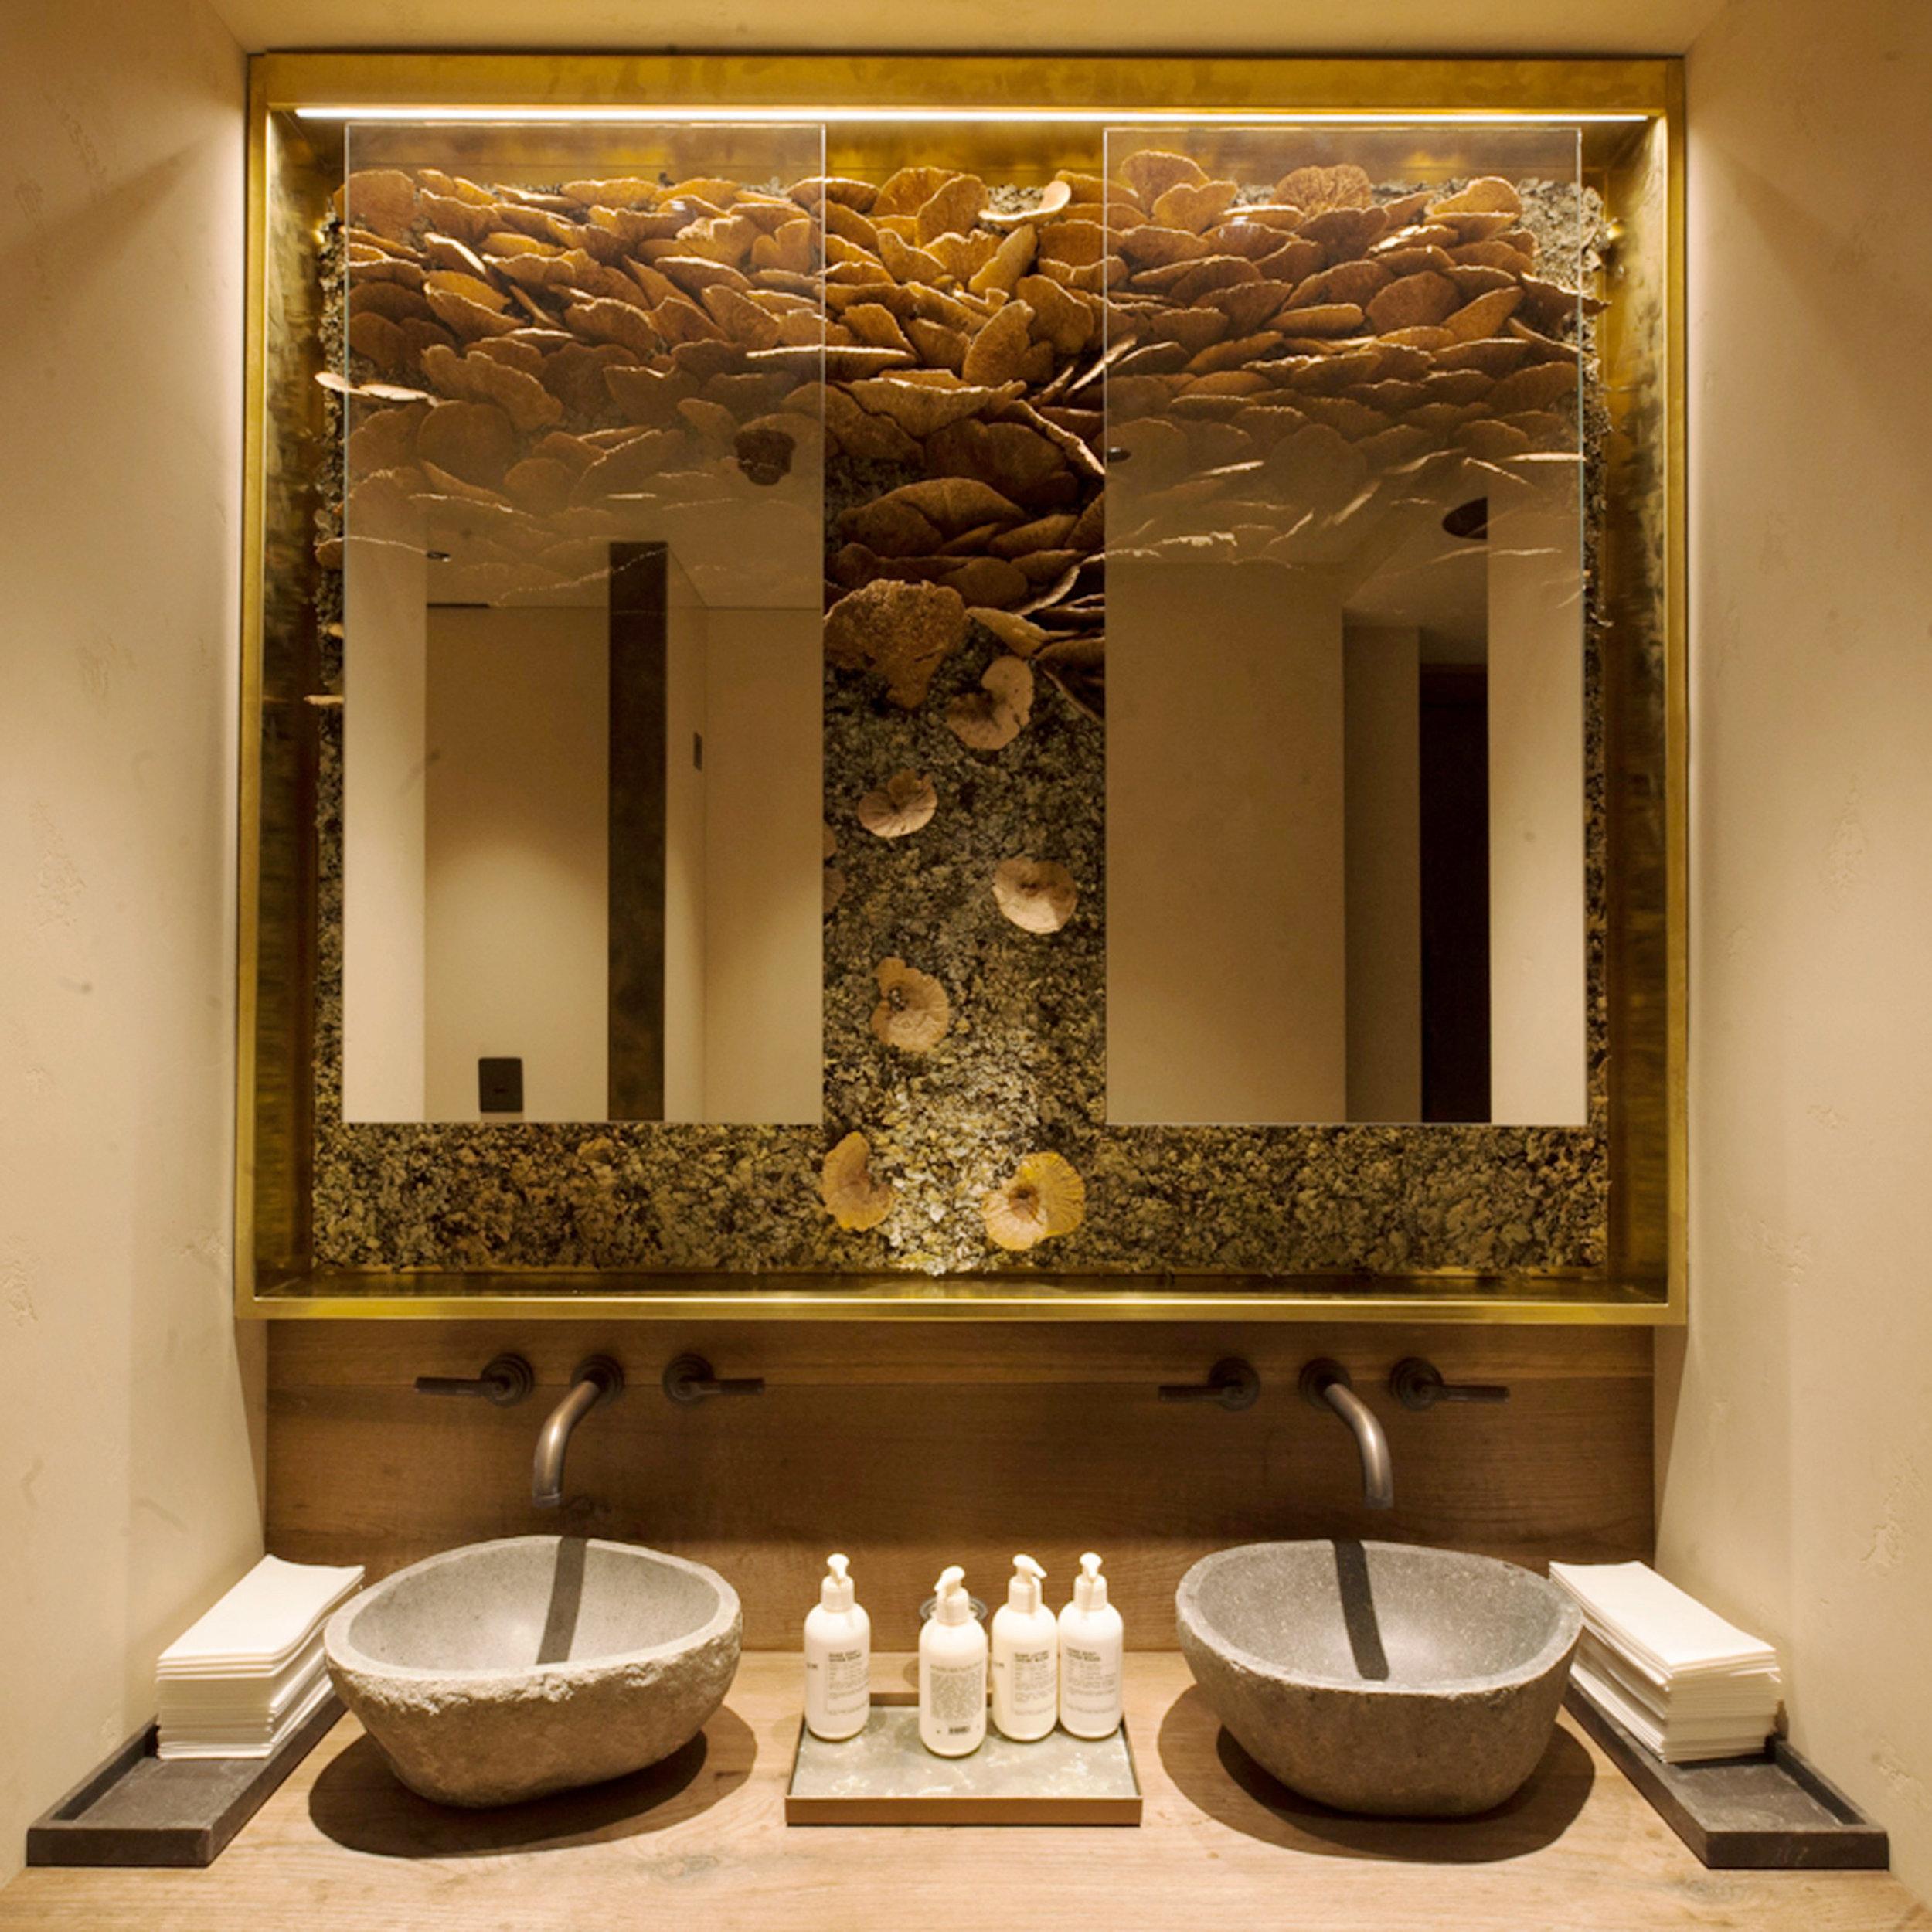 Hide-Restaurant-Dabbous-Interior-Designer-Funghi-Wall-Decor-TWW.jpg